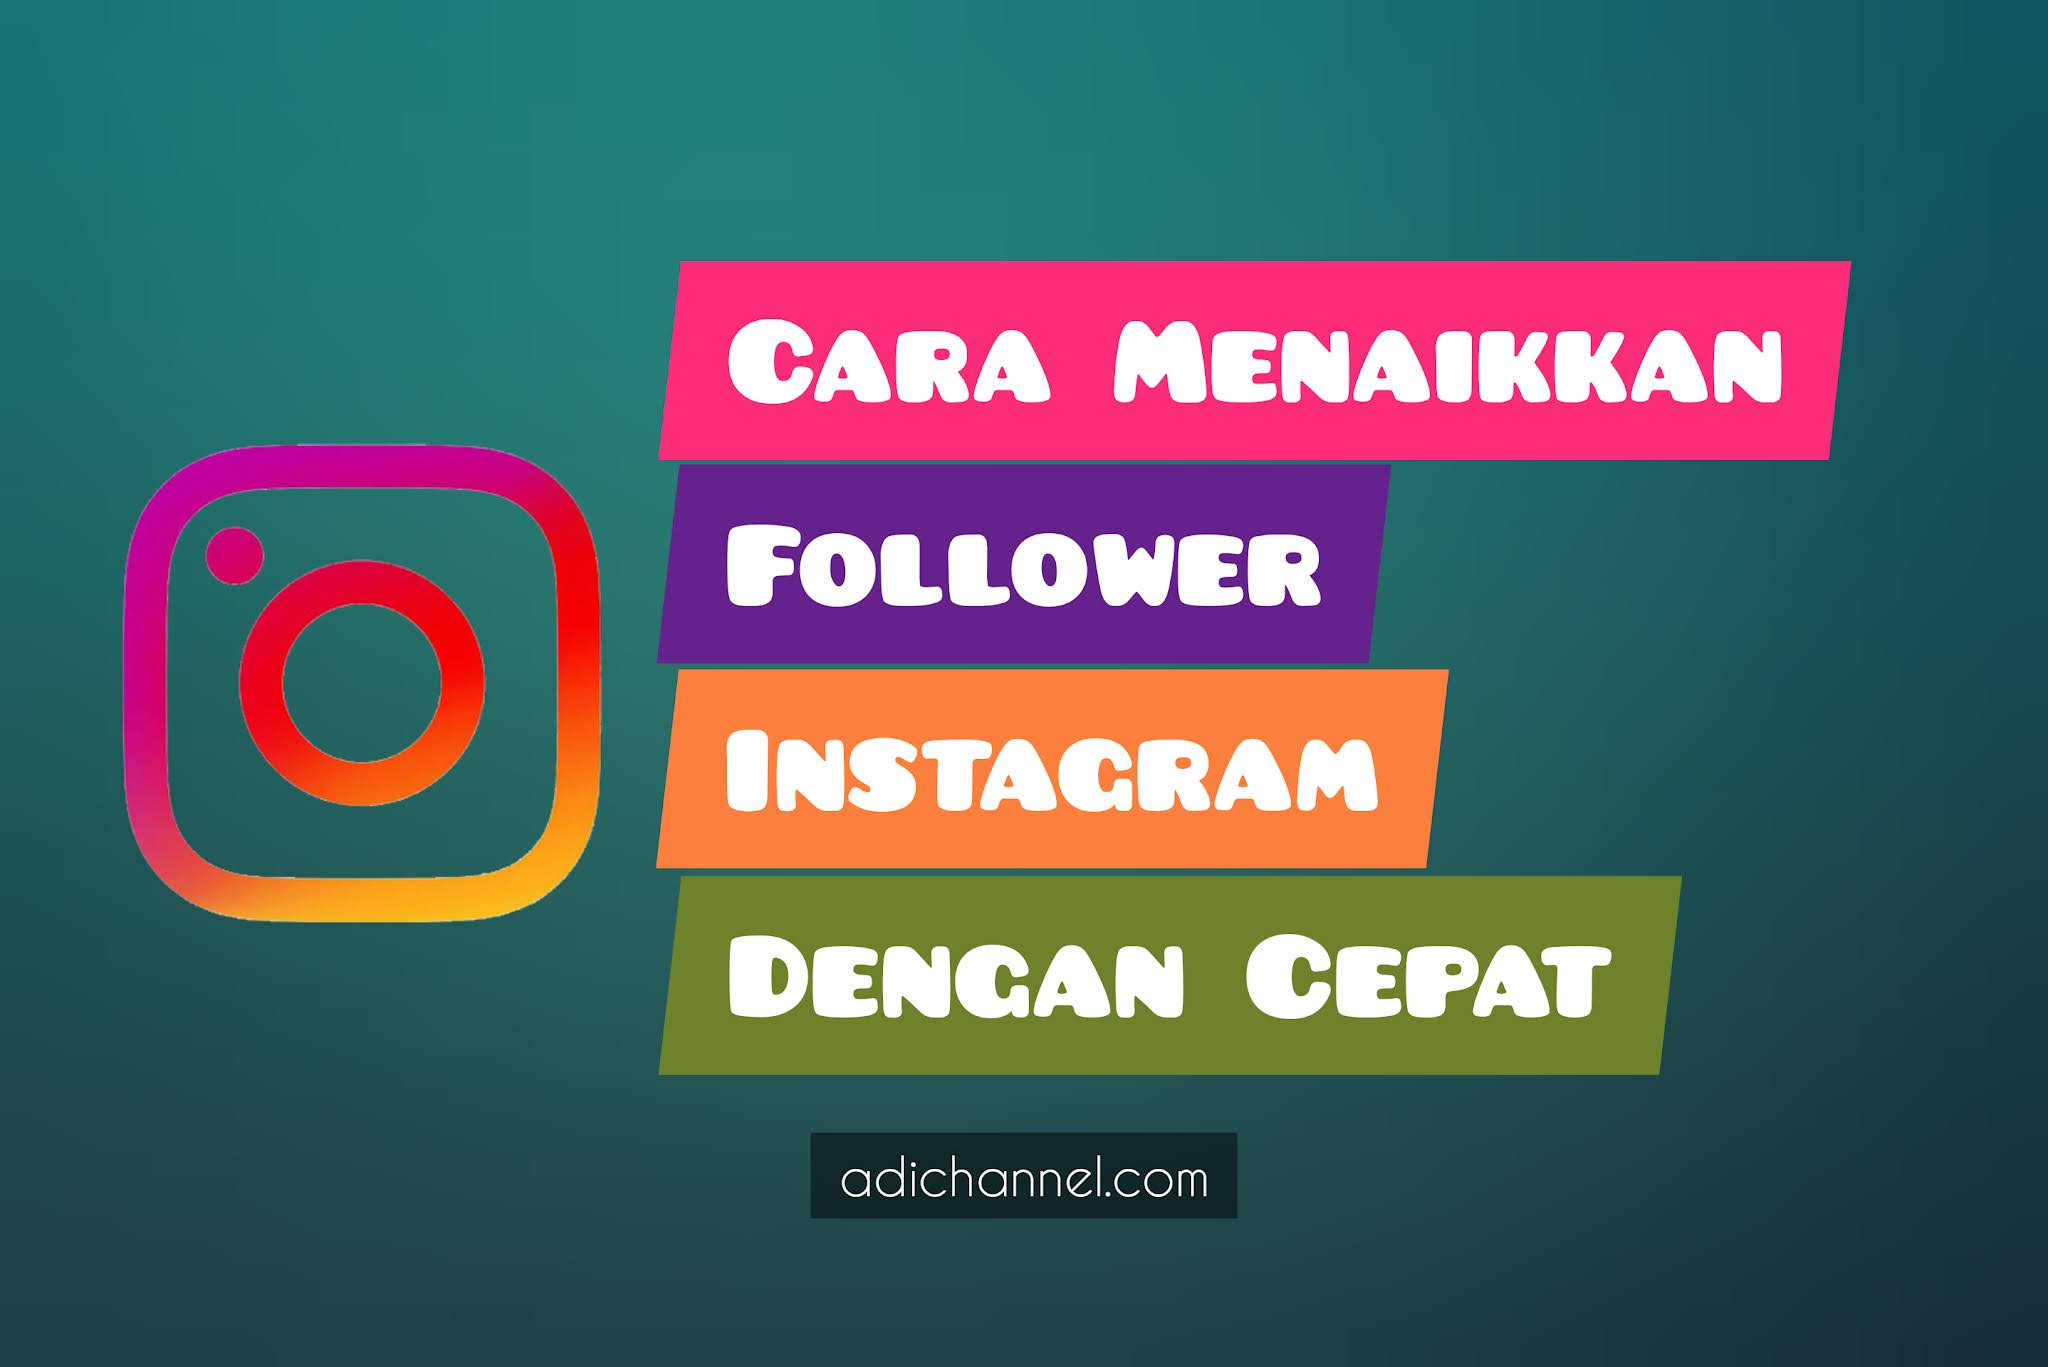 Cara Meningkatkan Follower Instagram Dengan Cepat 2021